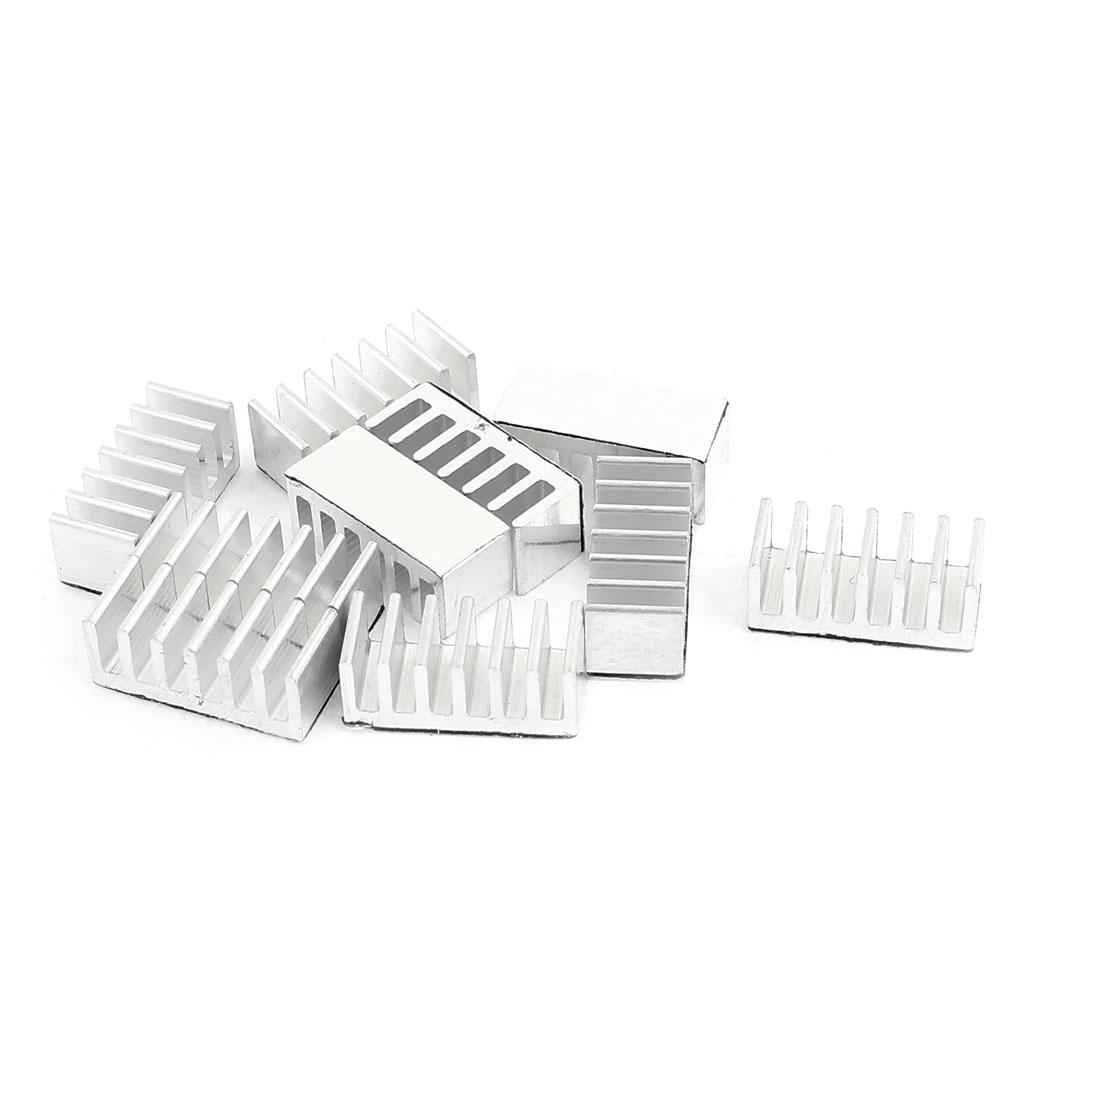 10Pcs Aluminium 6 x 14 x 6mm Heat Sink Radiator Cooling Fin Heatsink Silver Tone